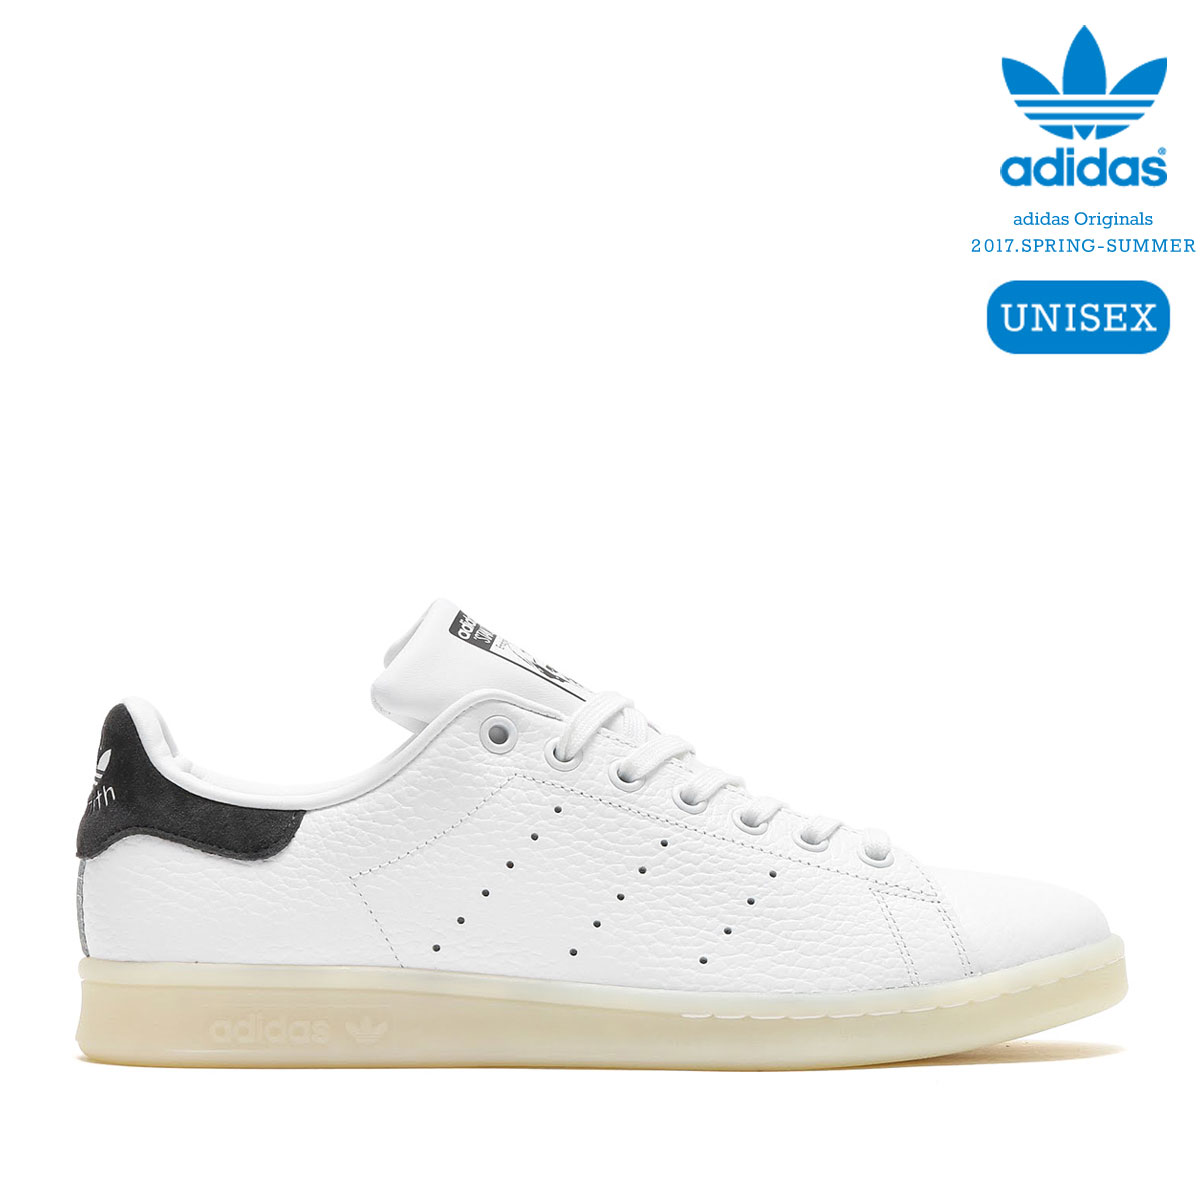 adidas Originals STAN SMITH (Running White/Running White/Utility Black) (Adidas originals Stan Smith)